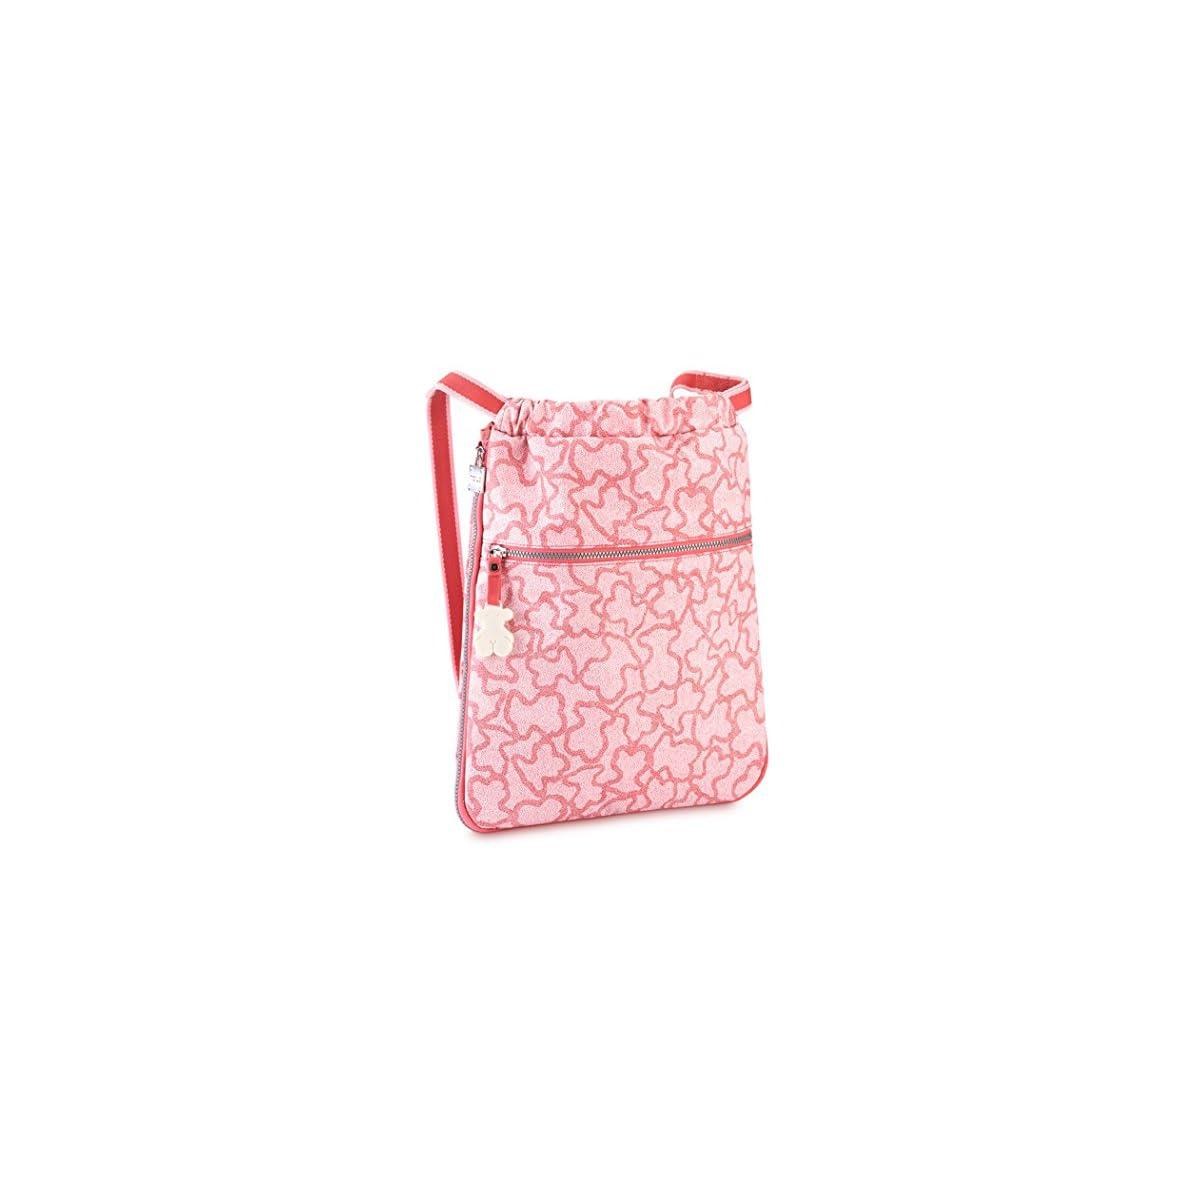 51q%2BUALja3L. SS1200  - Mochila Tous Caine Kaos New Colores Rosa